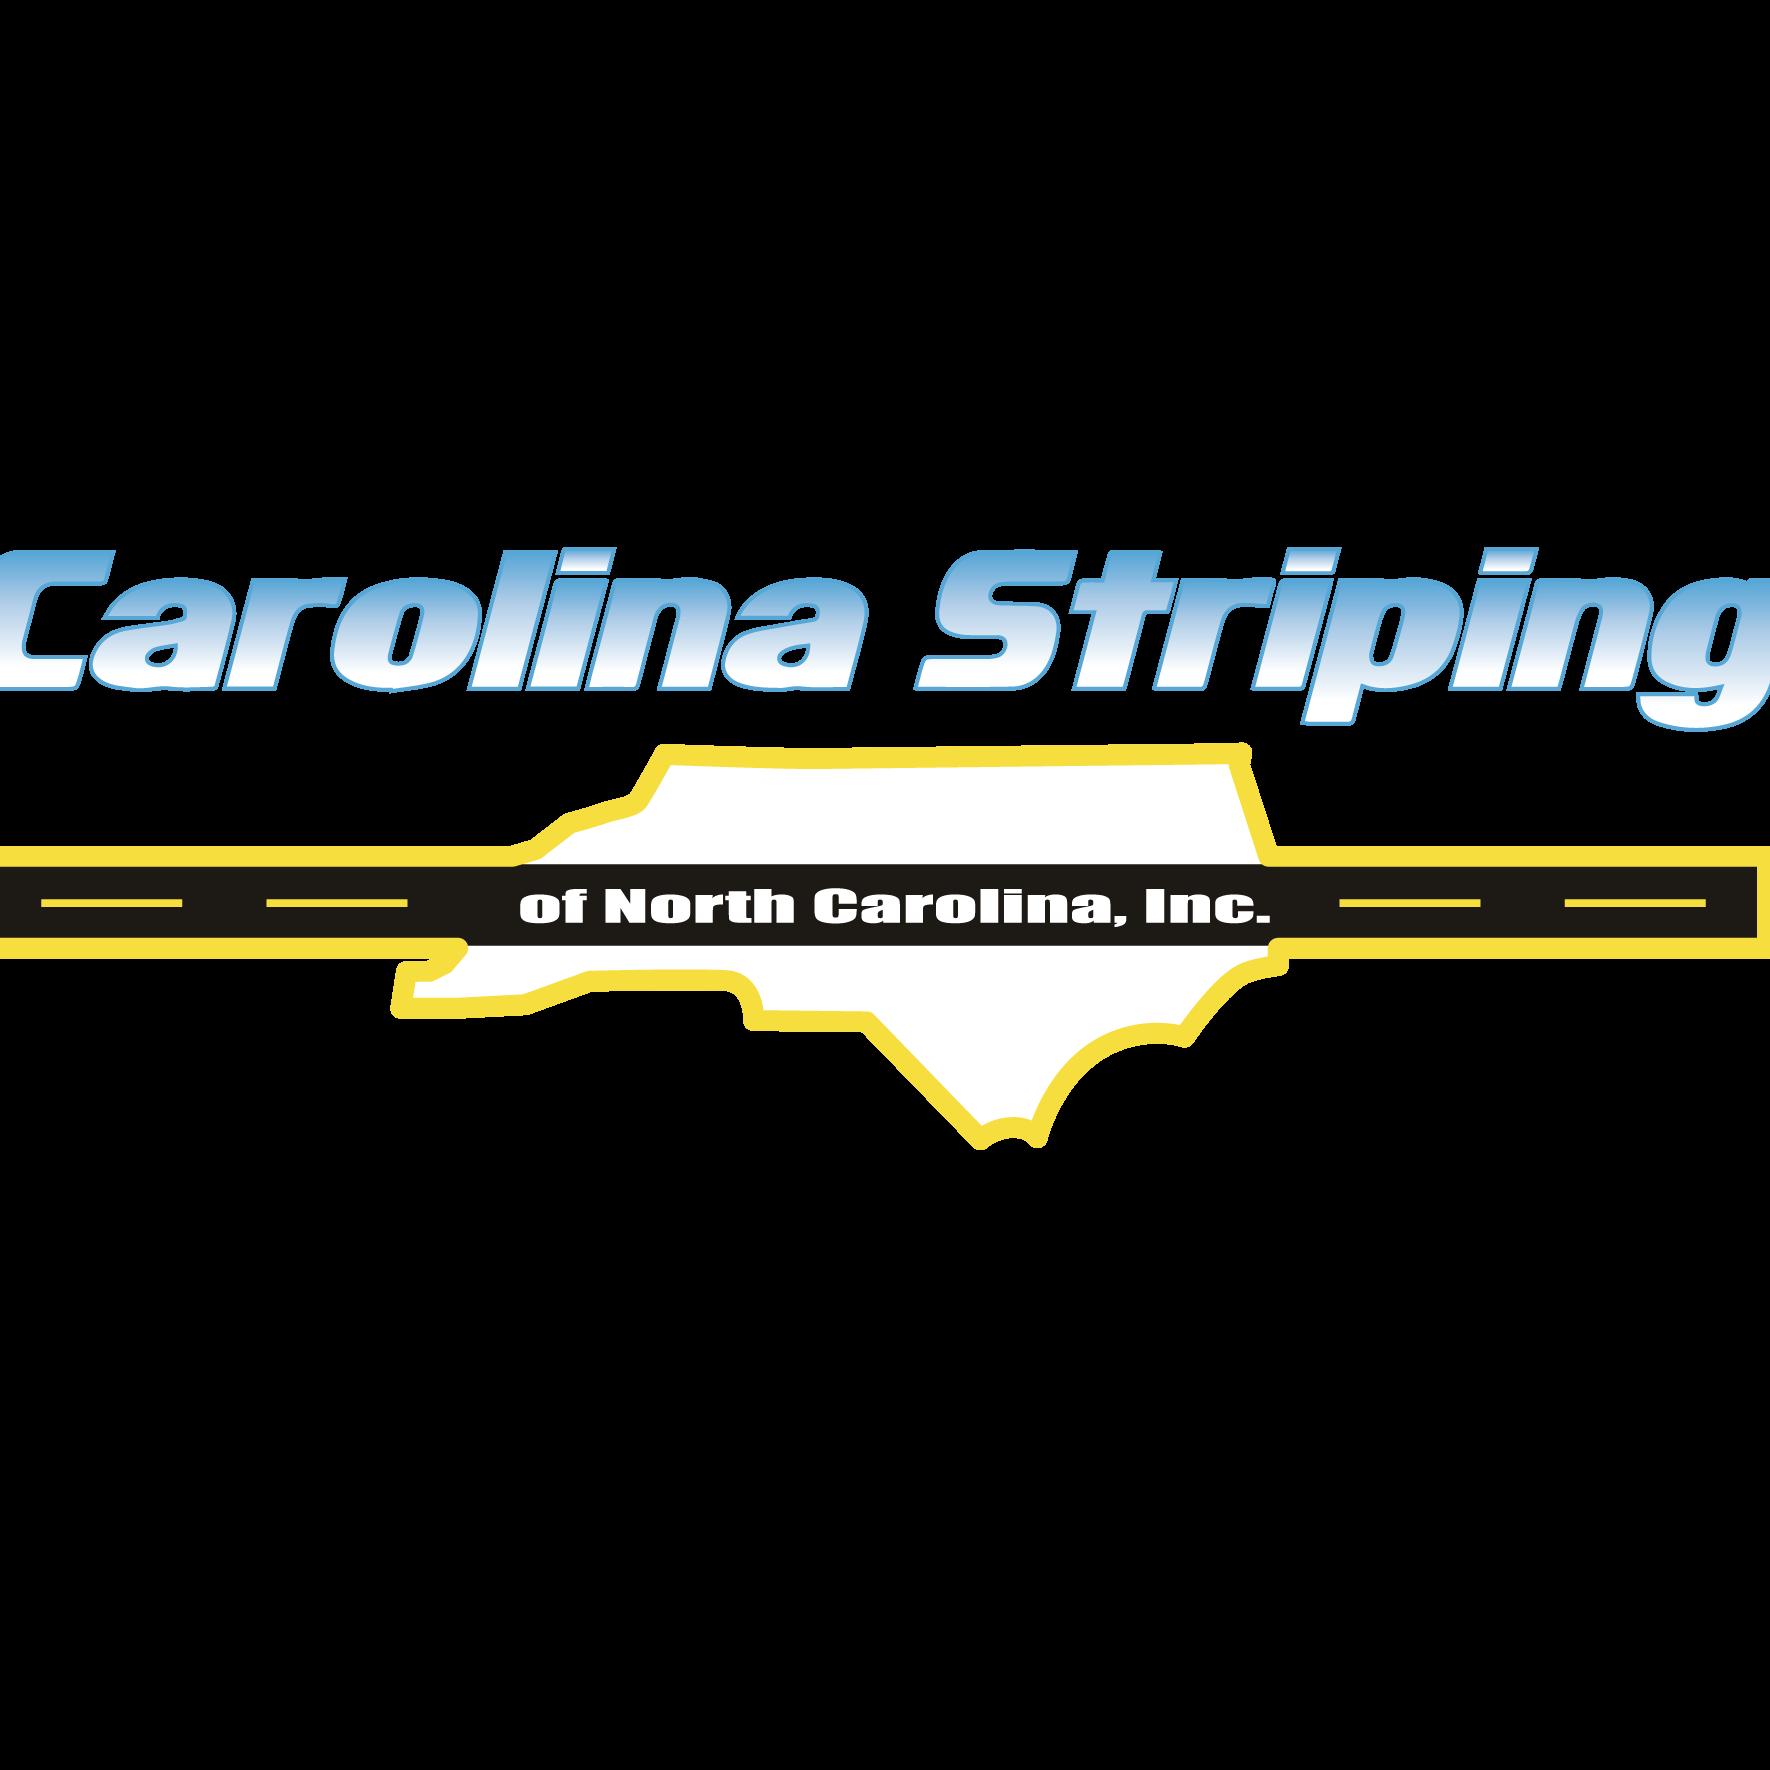 Carolina Striping